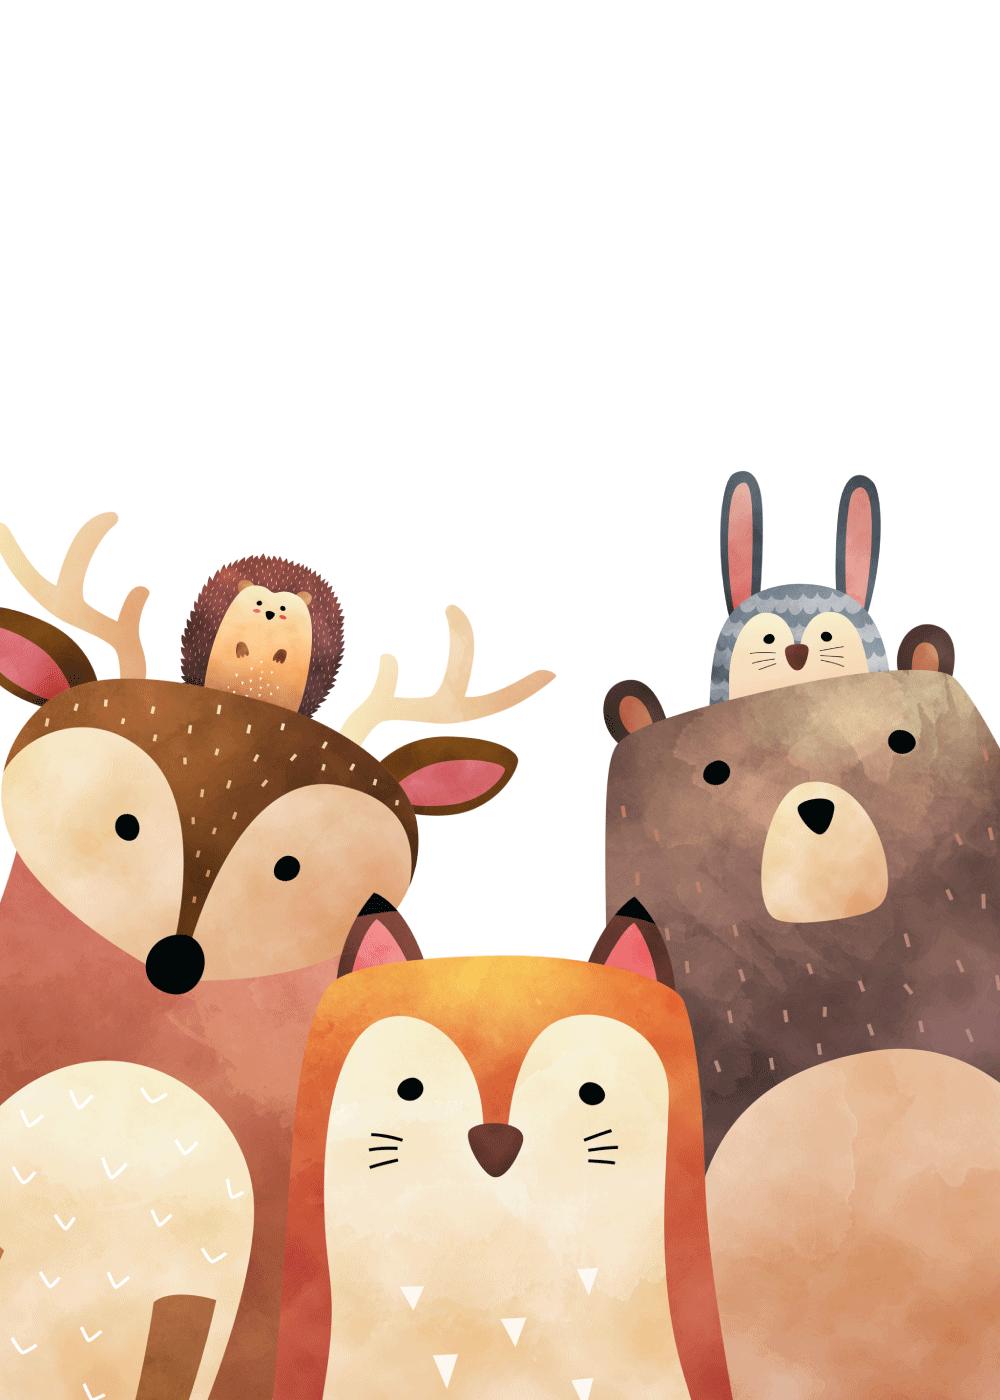 Køb Skovens dyr plakat